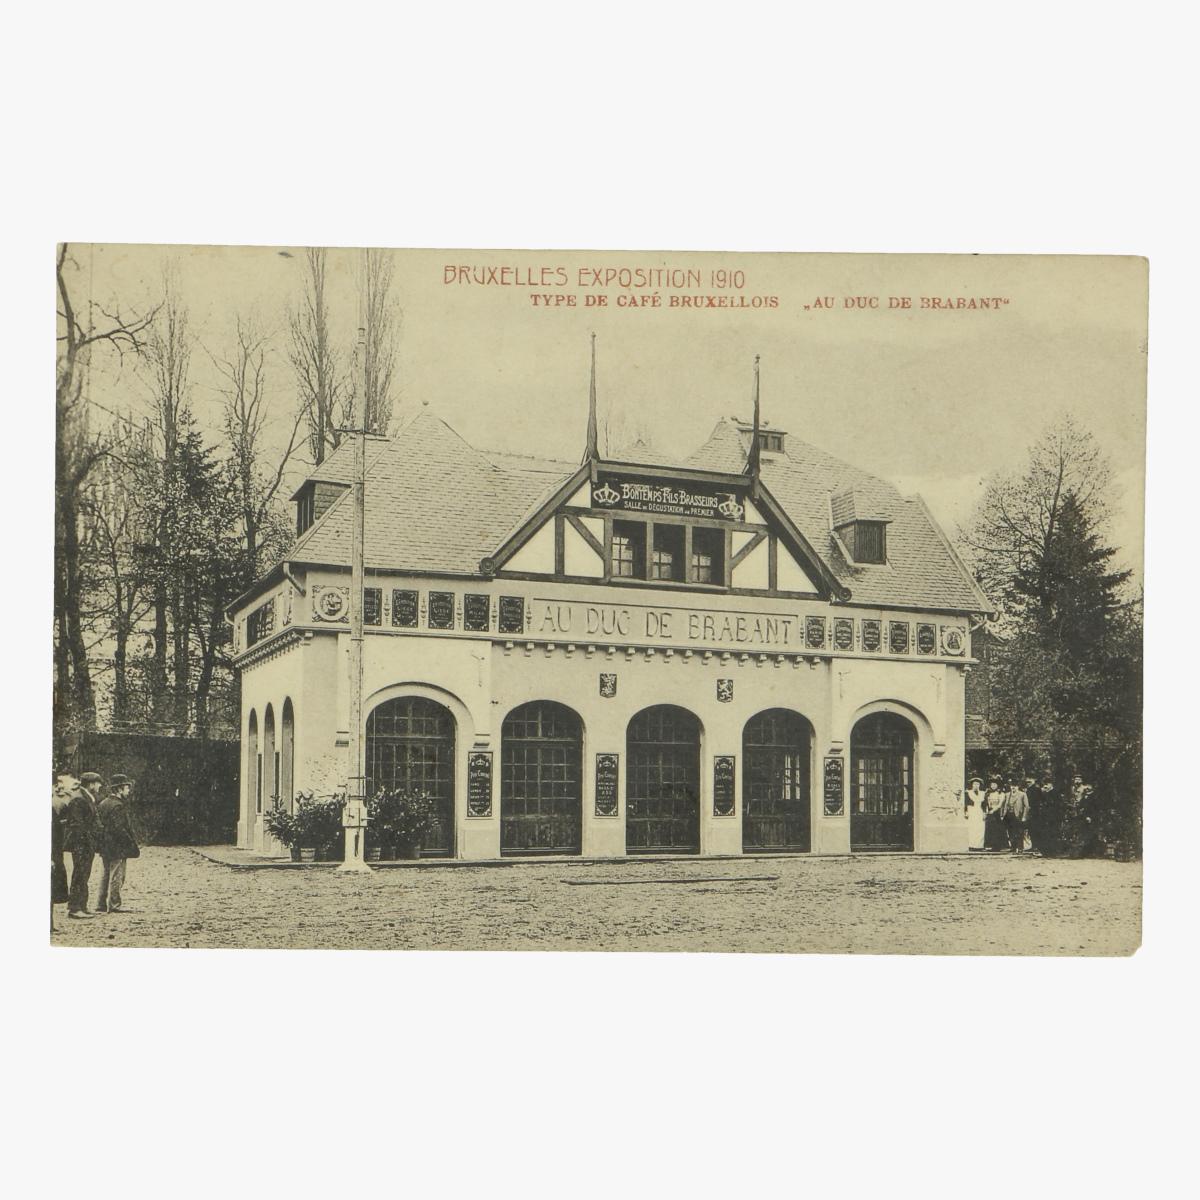 Afbeeldingen van postkaart bruxelles exposition 1910 type de café bruxellois au duc de brabant